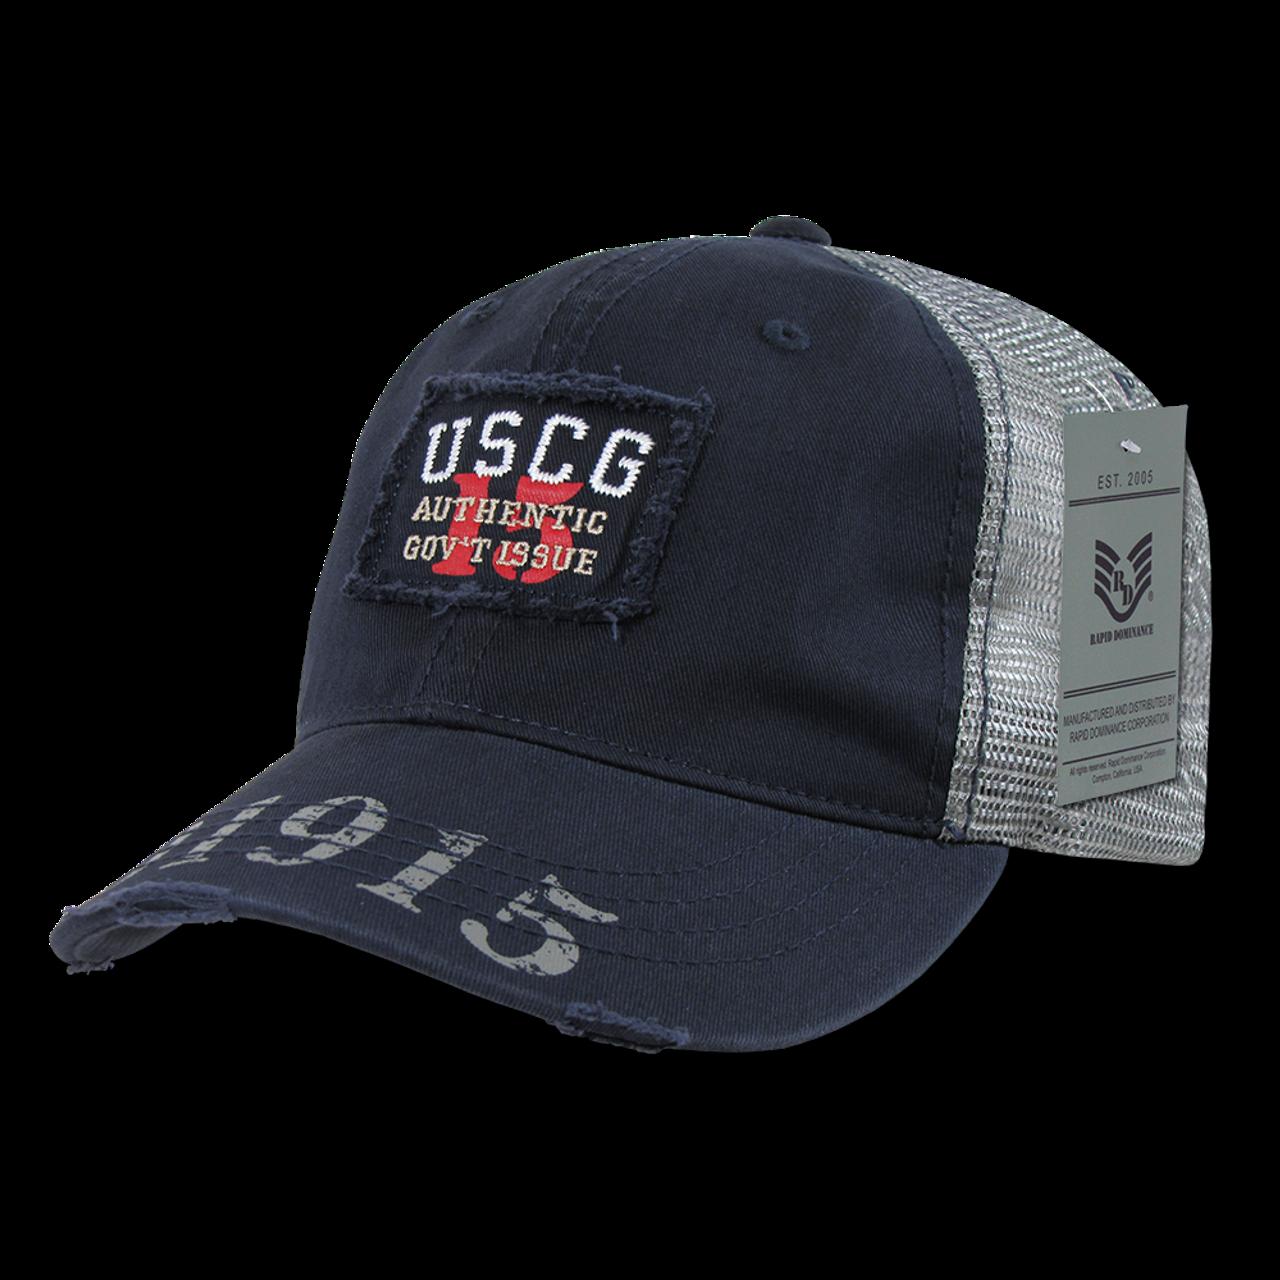 S85 - Coast Guard Cap USCG Vintage Military Patch Mesh Blue -  USMILITARYHATS.COM fd3b24db06ba